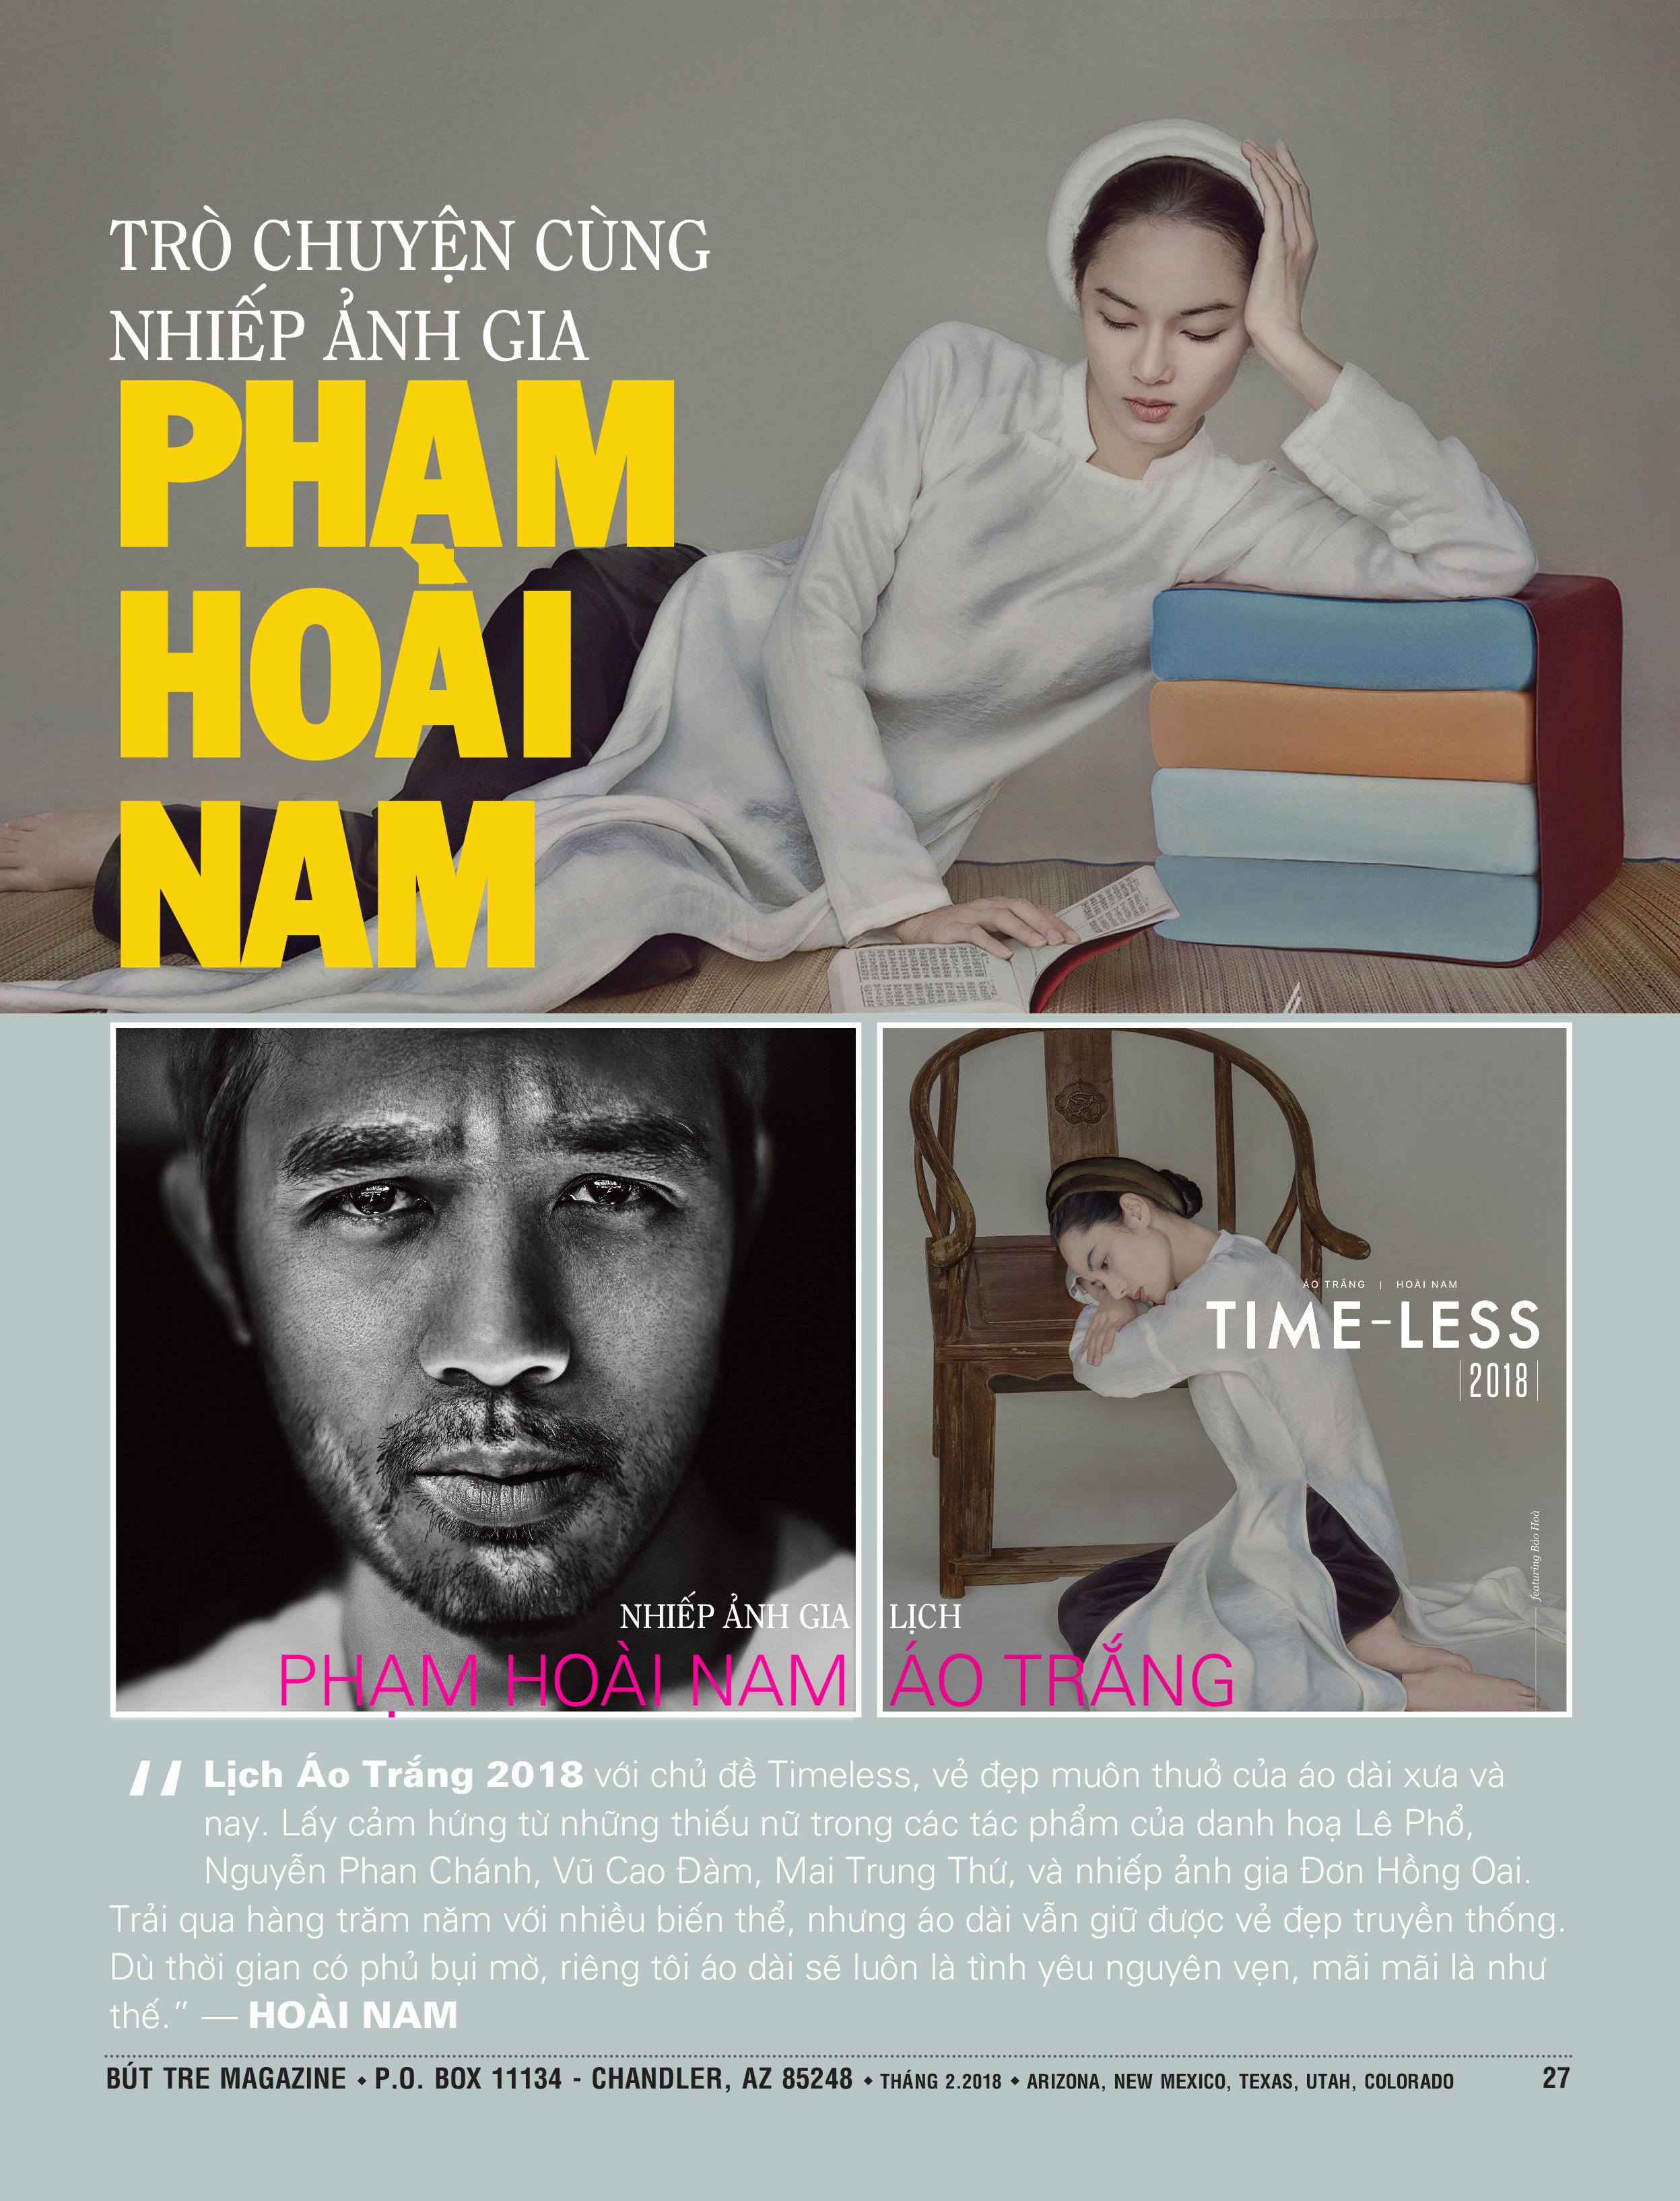 Pham-Hoai-Nam-But-Tre-Interview March 2018-1.jpg